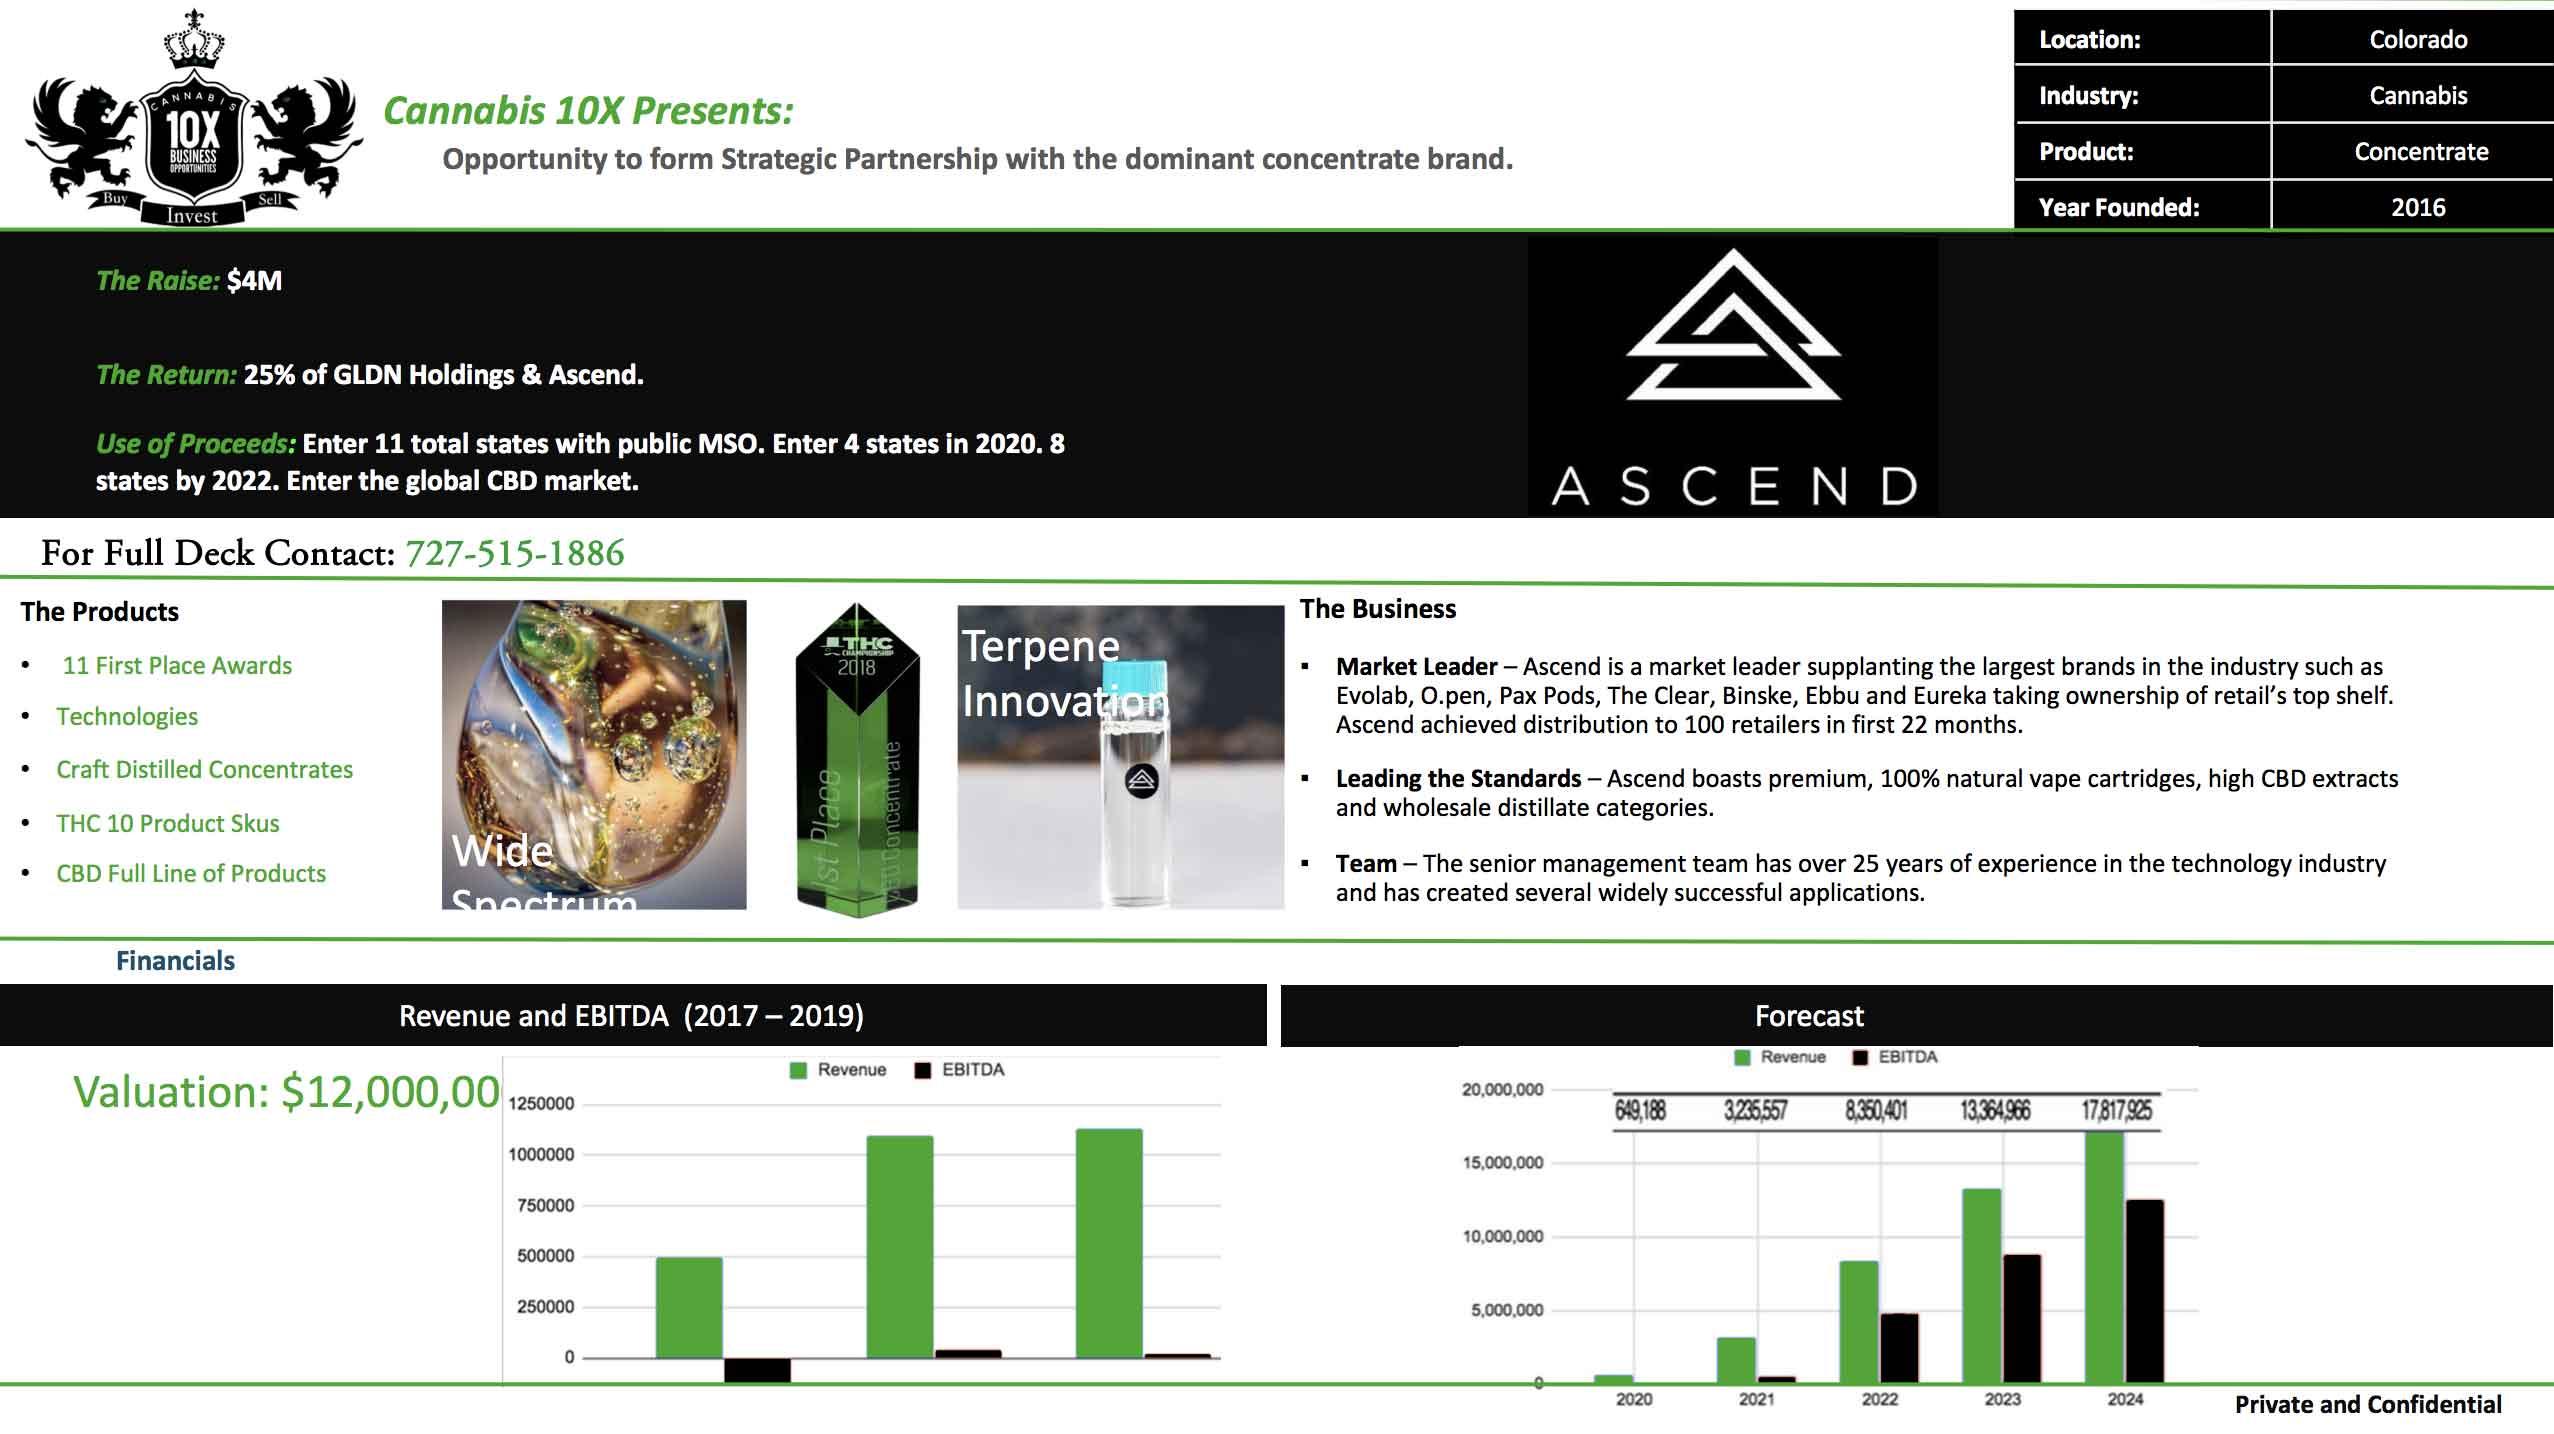 Ascend Cannabis Brand Capital Raise